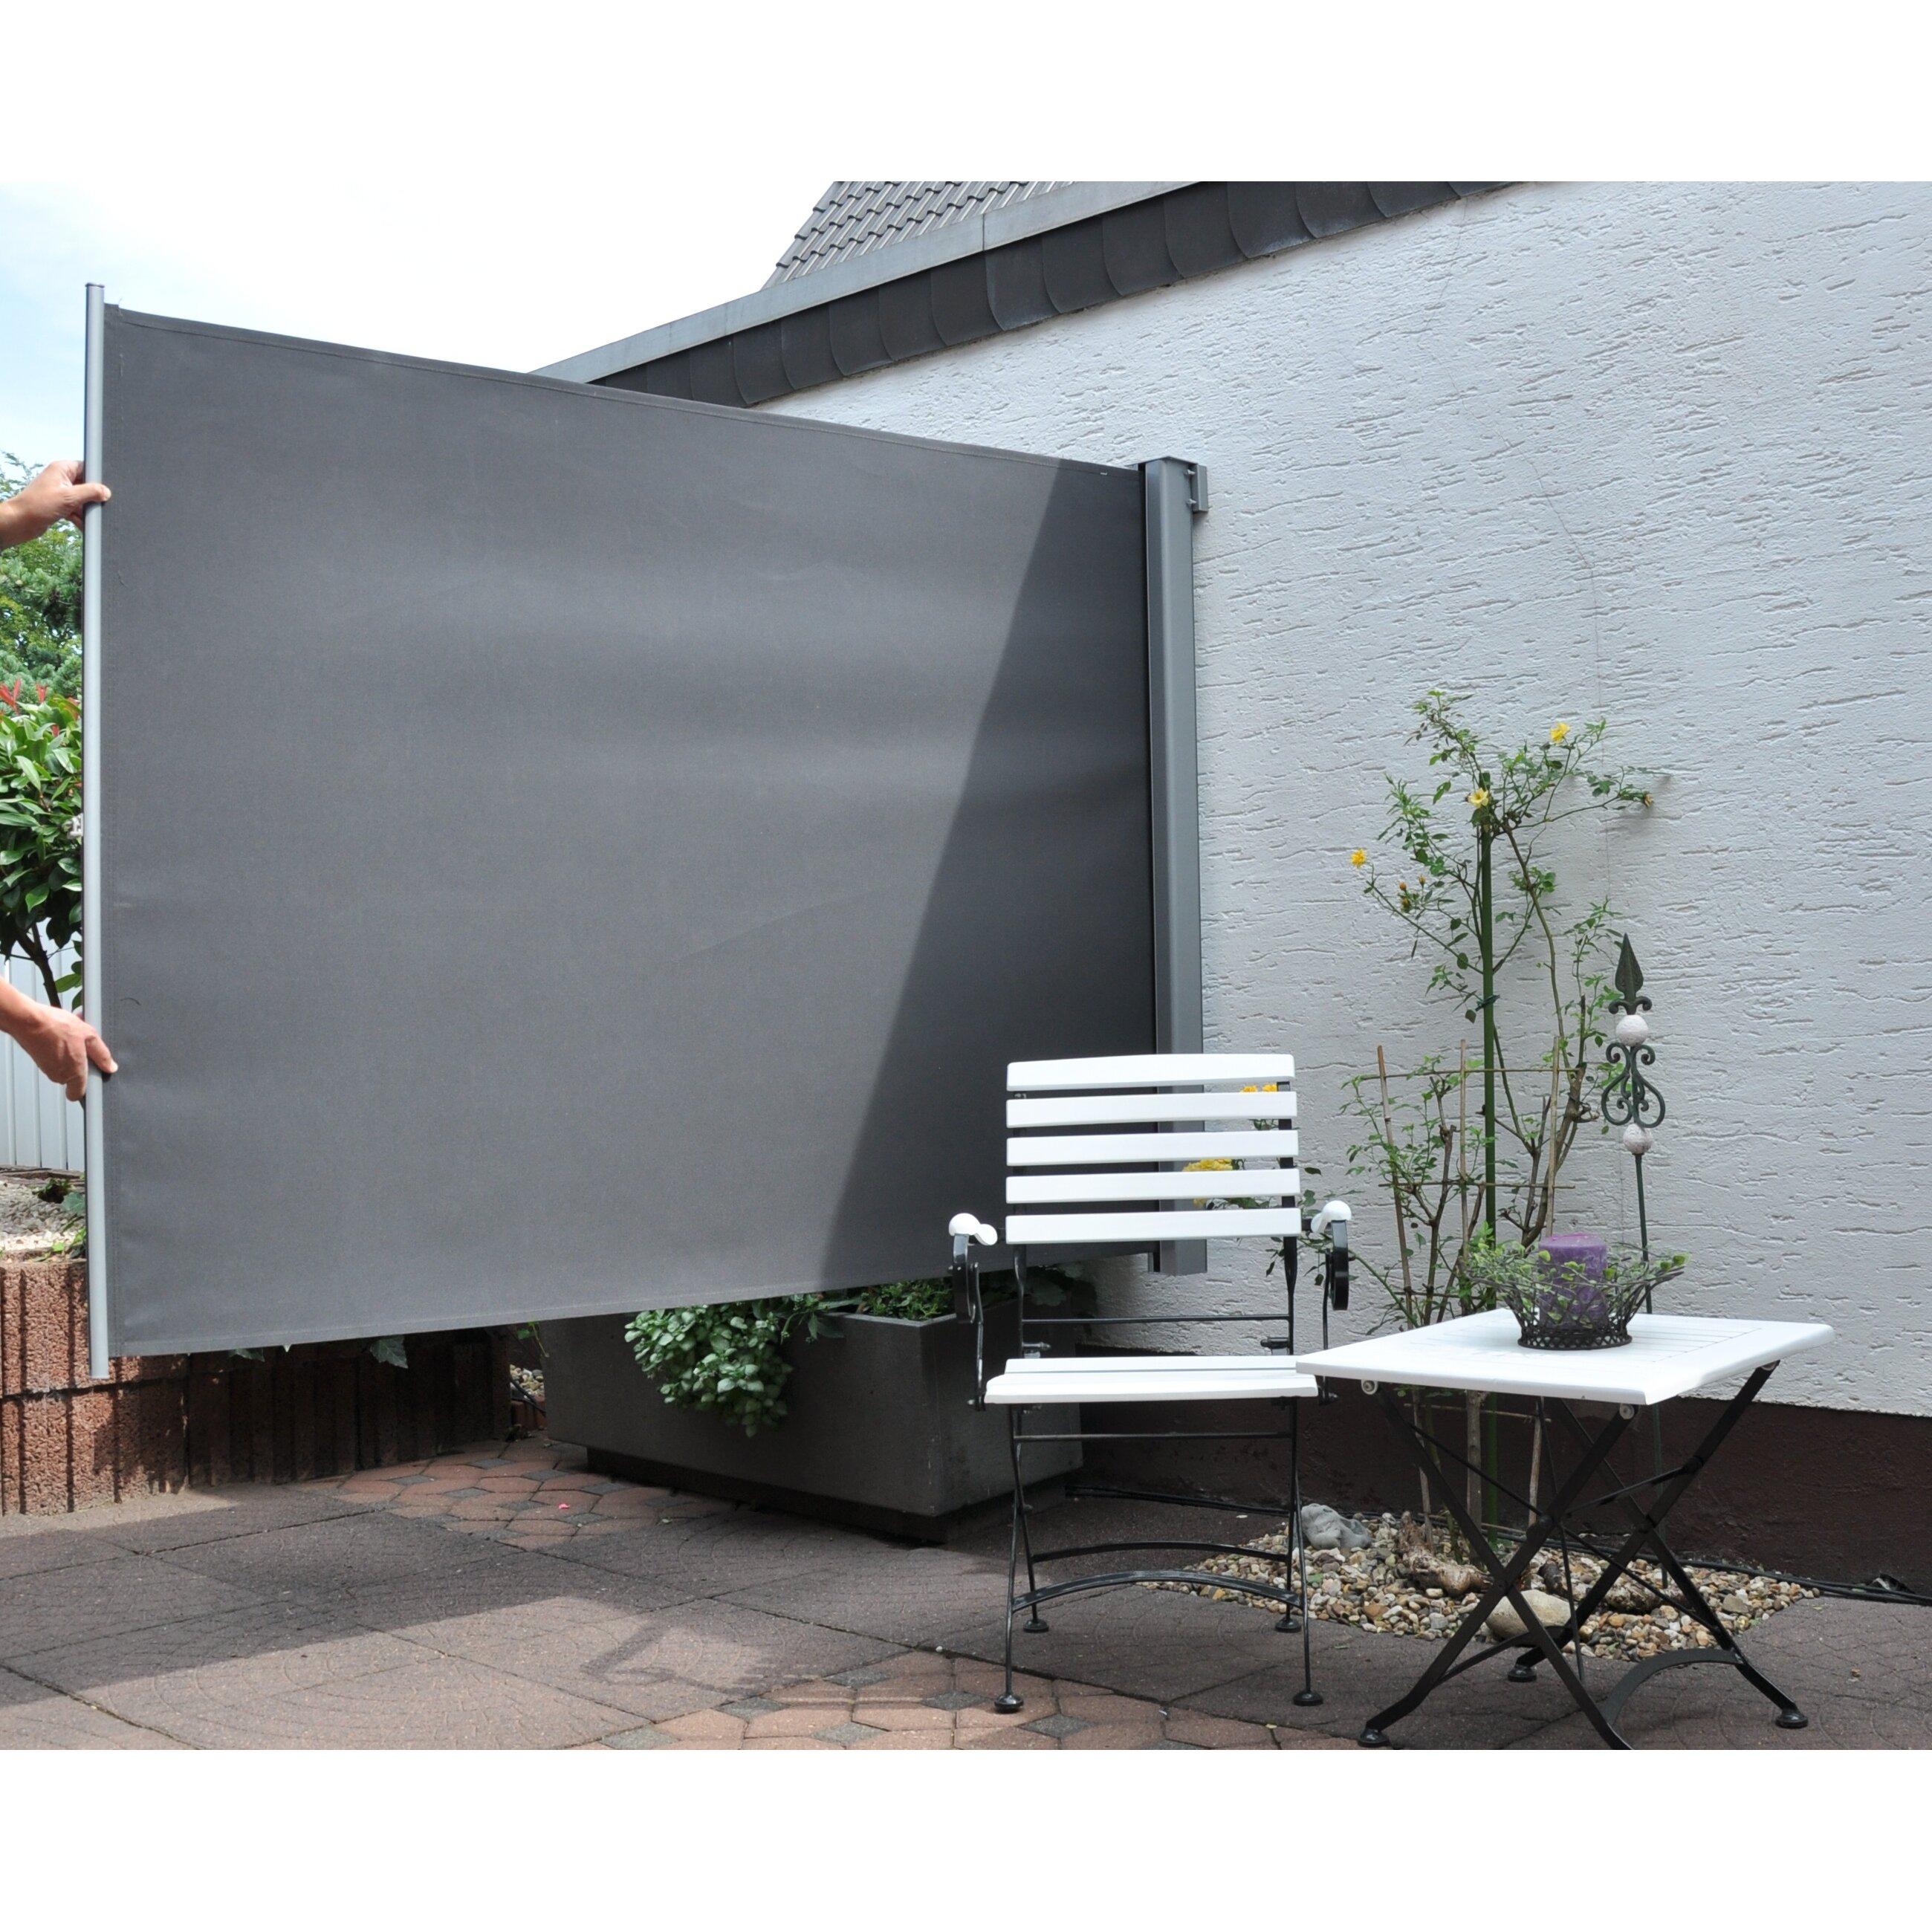 leco 200cm x 120cm balcony 1 panel room divider wayfair uk On fenetre 200x95